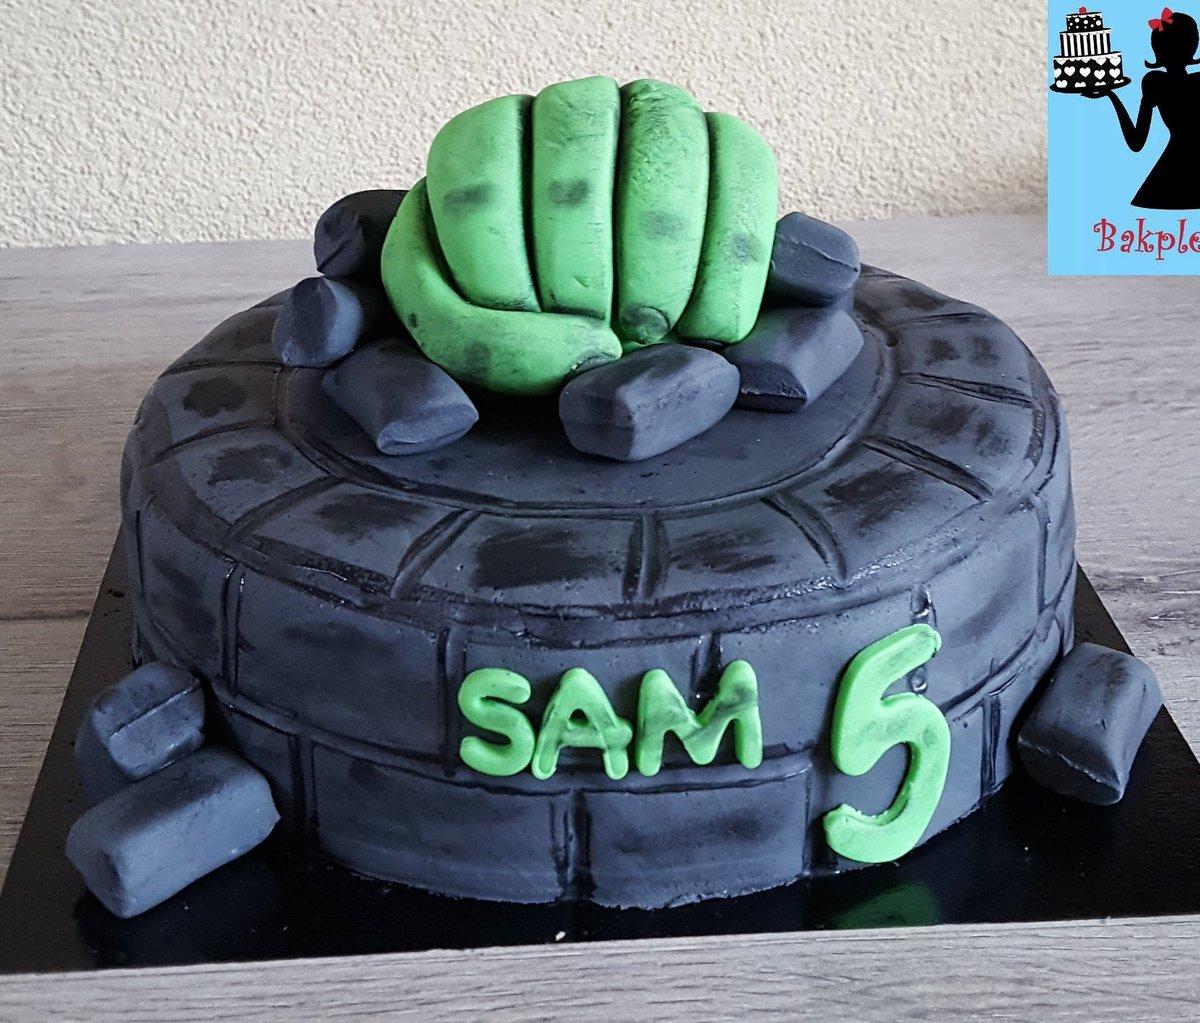 Marvelous Bakplezier On Twitter Hulk Birthday Cake Birthday Cake Funny Birthday Cards Online Alyptdamsfinfo